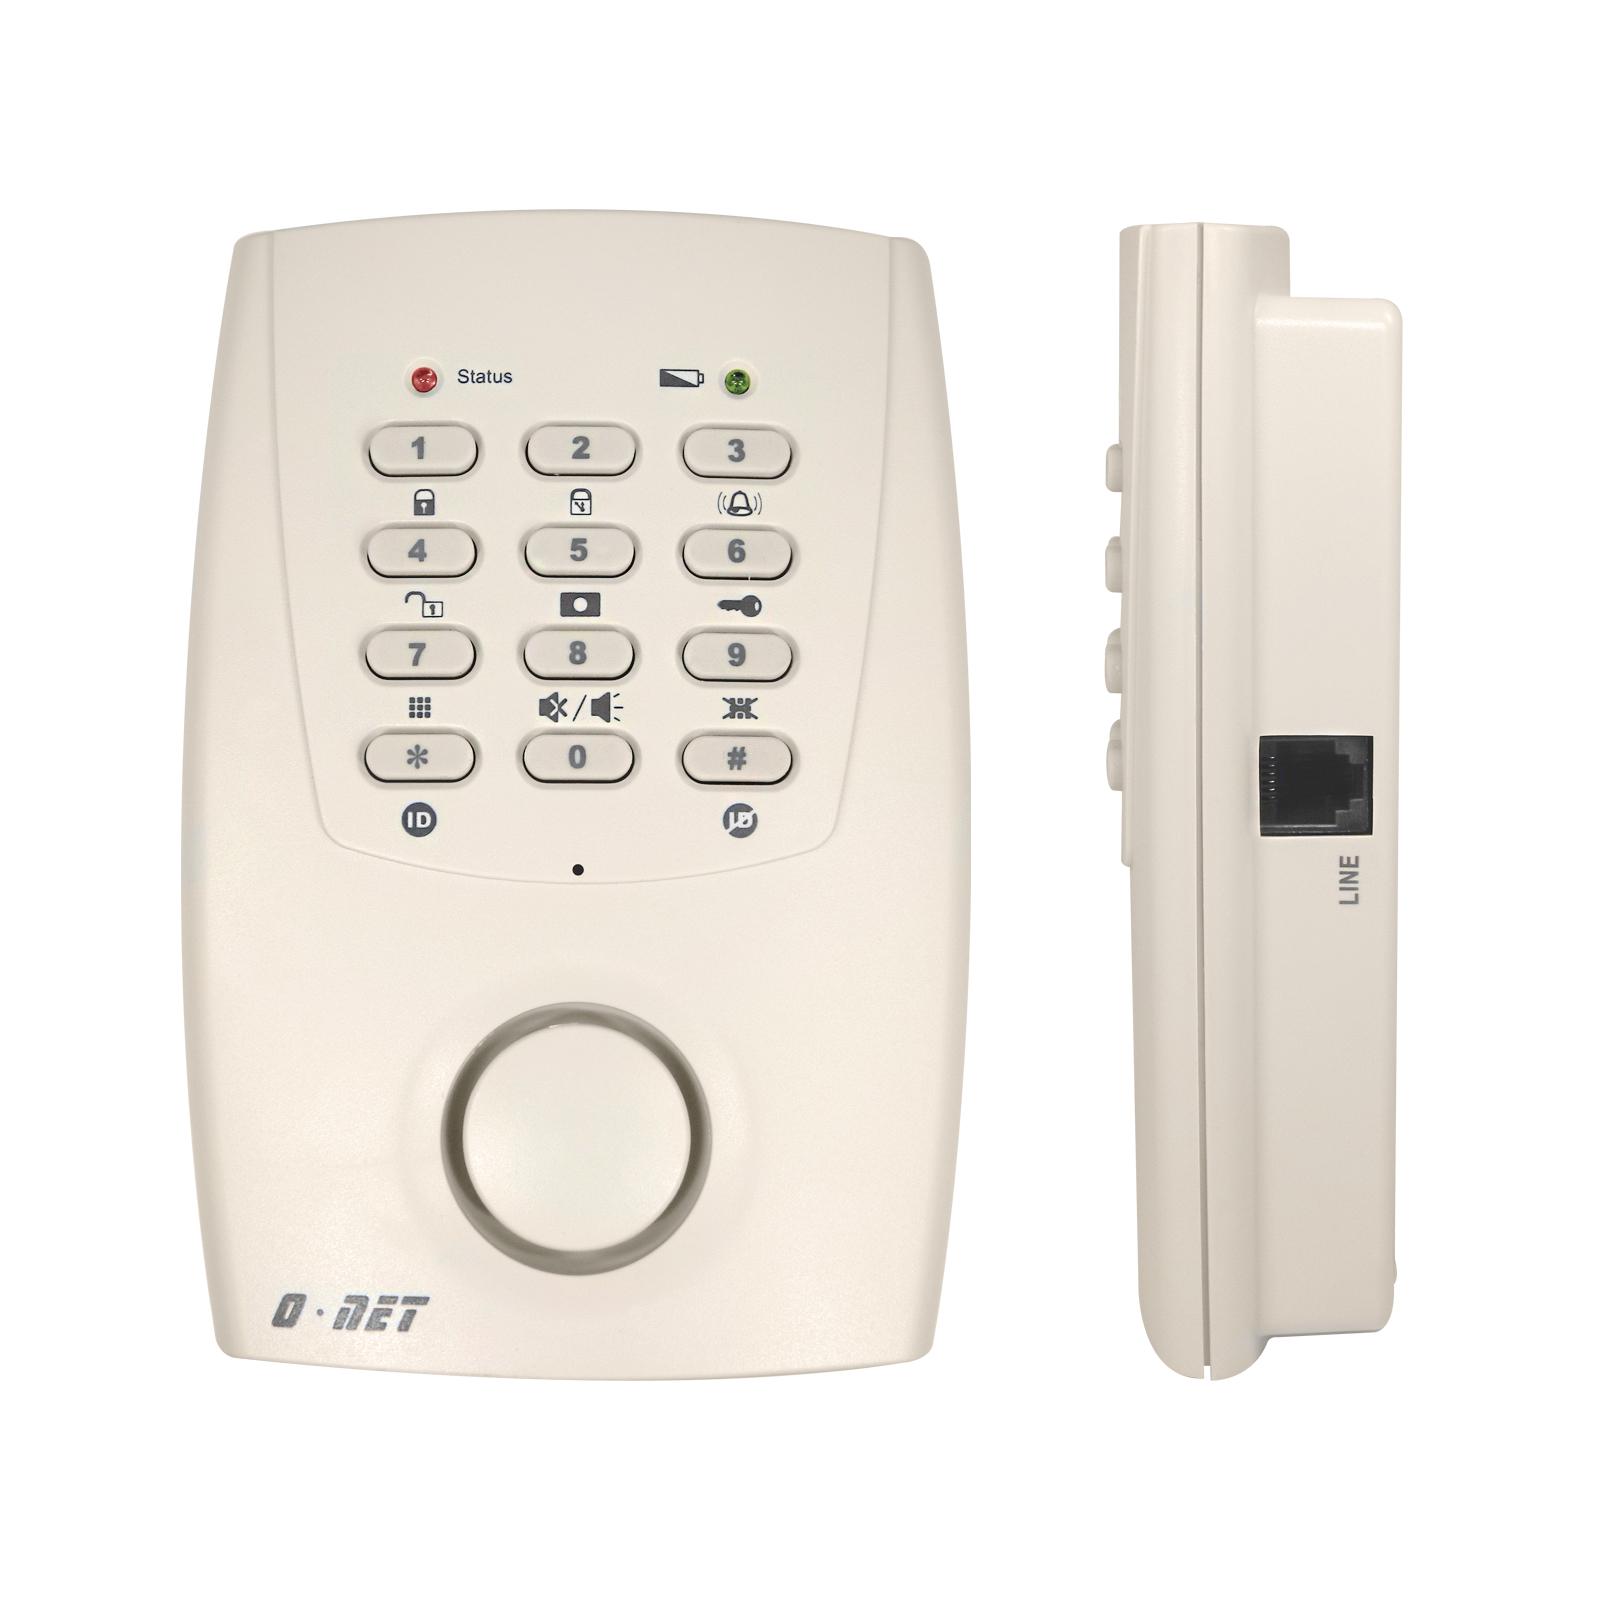 alarmanlage alarmsystem funkhaus alarmanlage sirene sensor bewegungsmelder 5tlg ebay. Black Bedroom Furniture Sets. Home Design Ideas